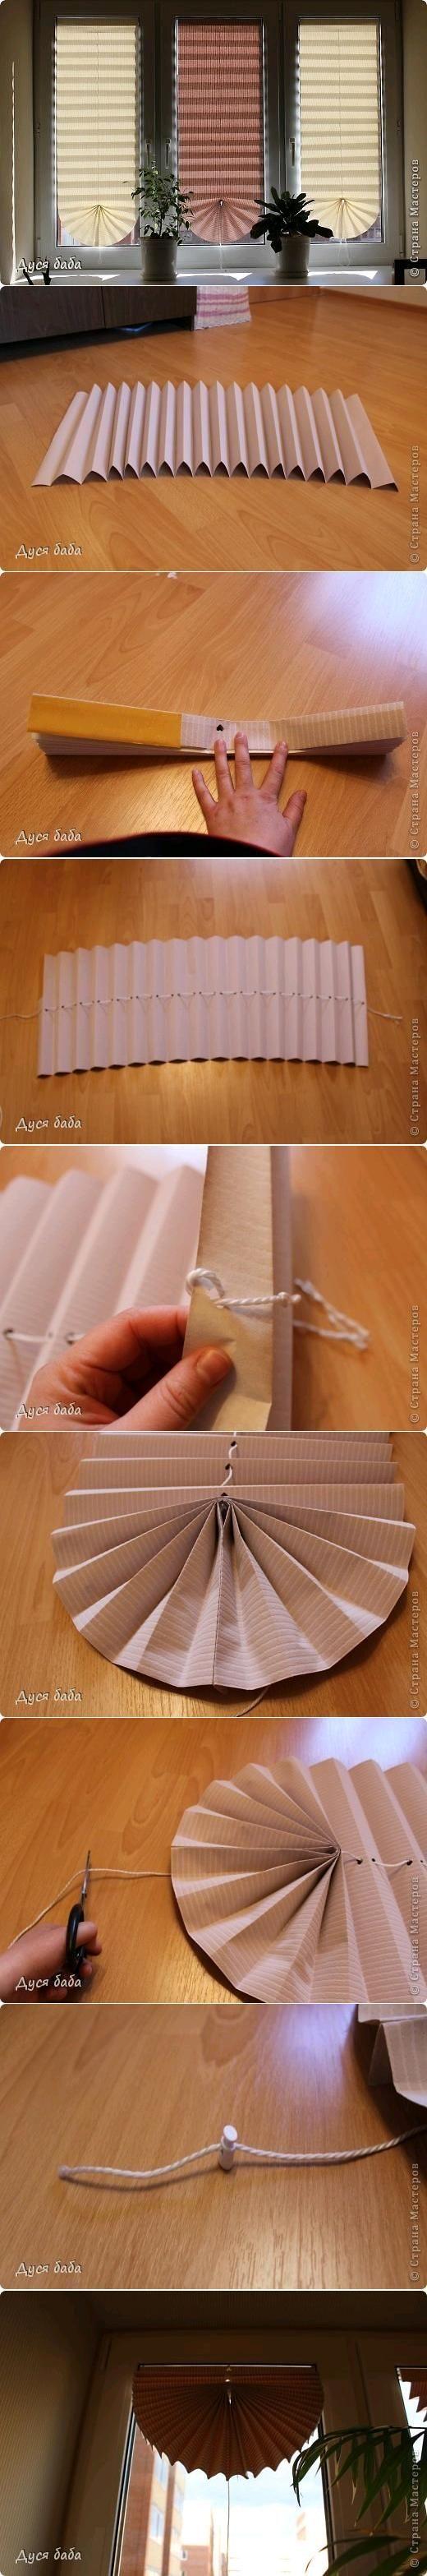 DIY Fan Curtain